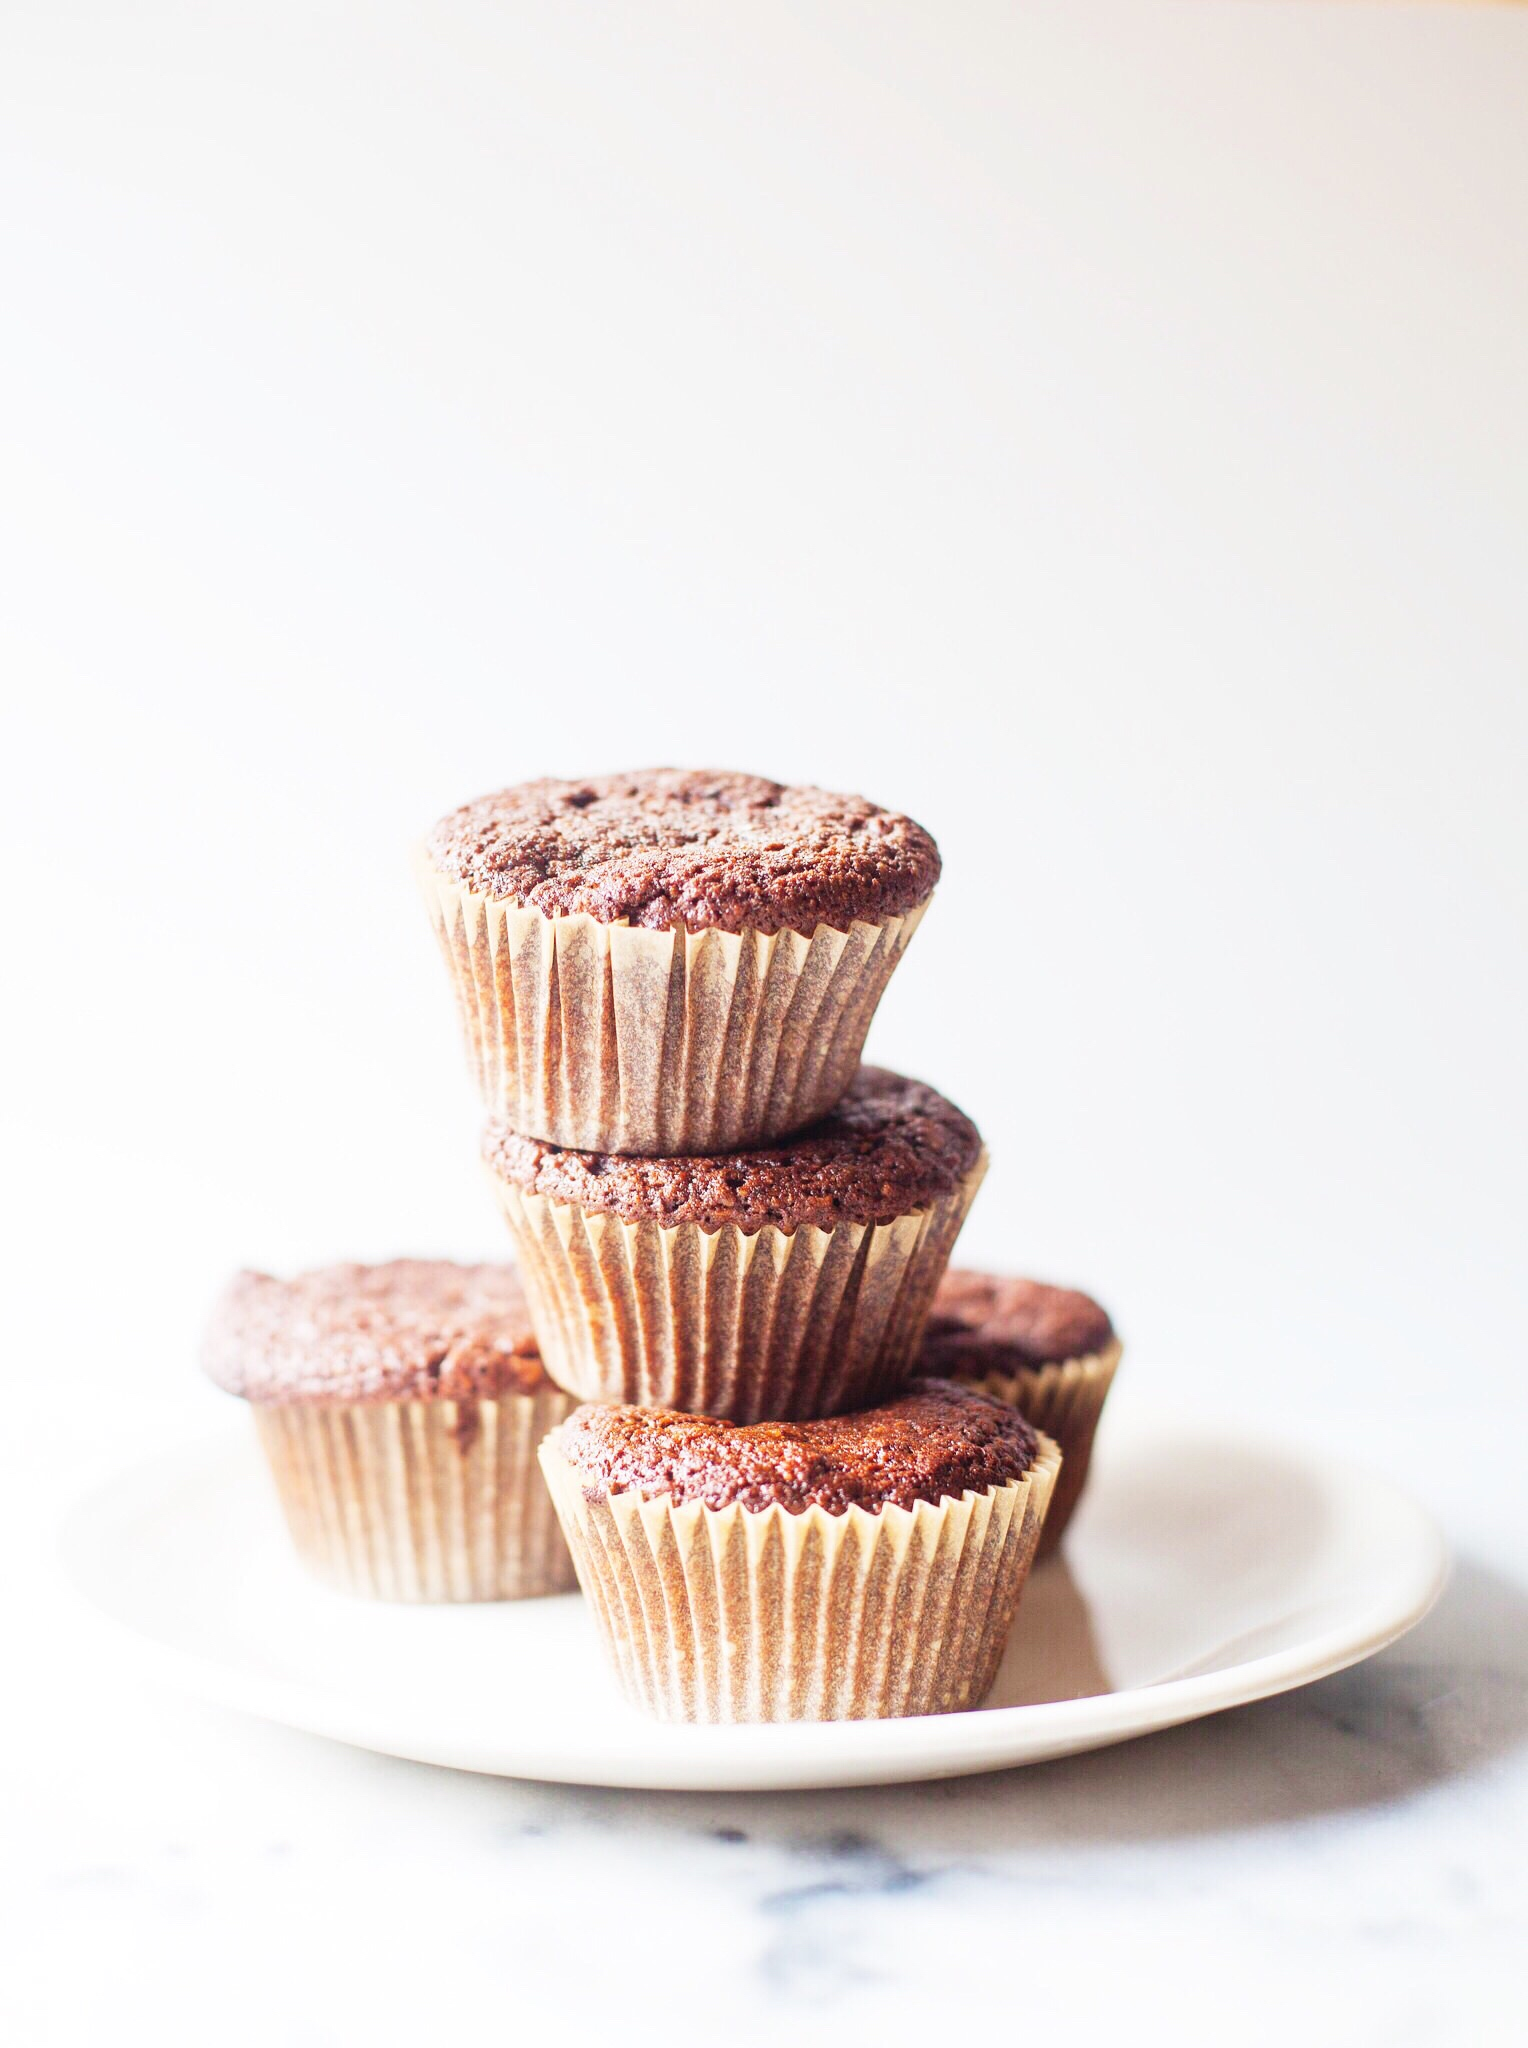 Banana cocoa muffins.